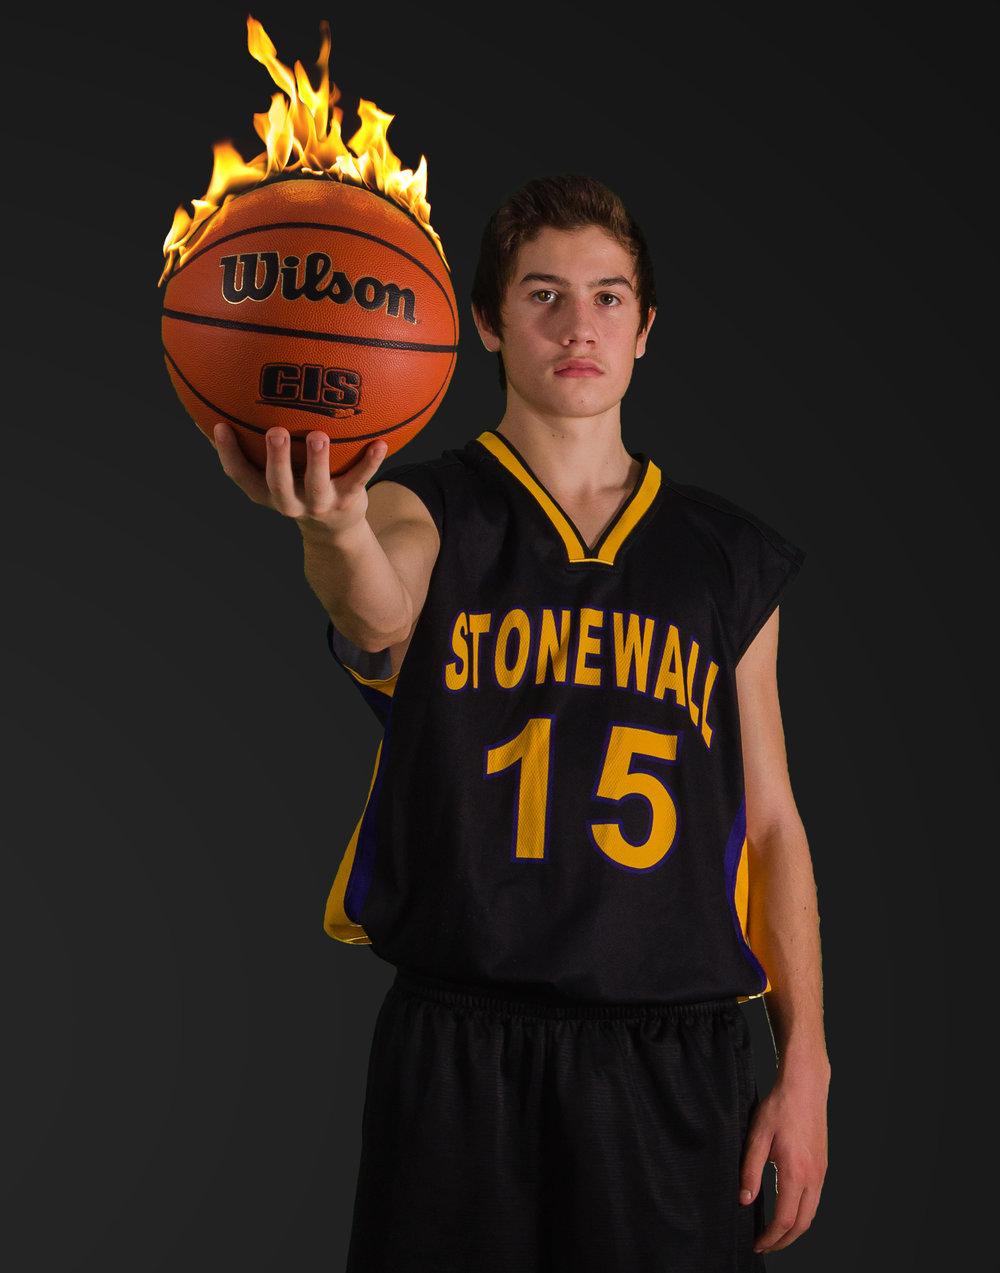 taylor-sheppard-photographer-stonewall-basketball-portrait-commercial-photoshop-fire-ball.jpg